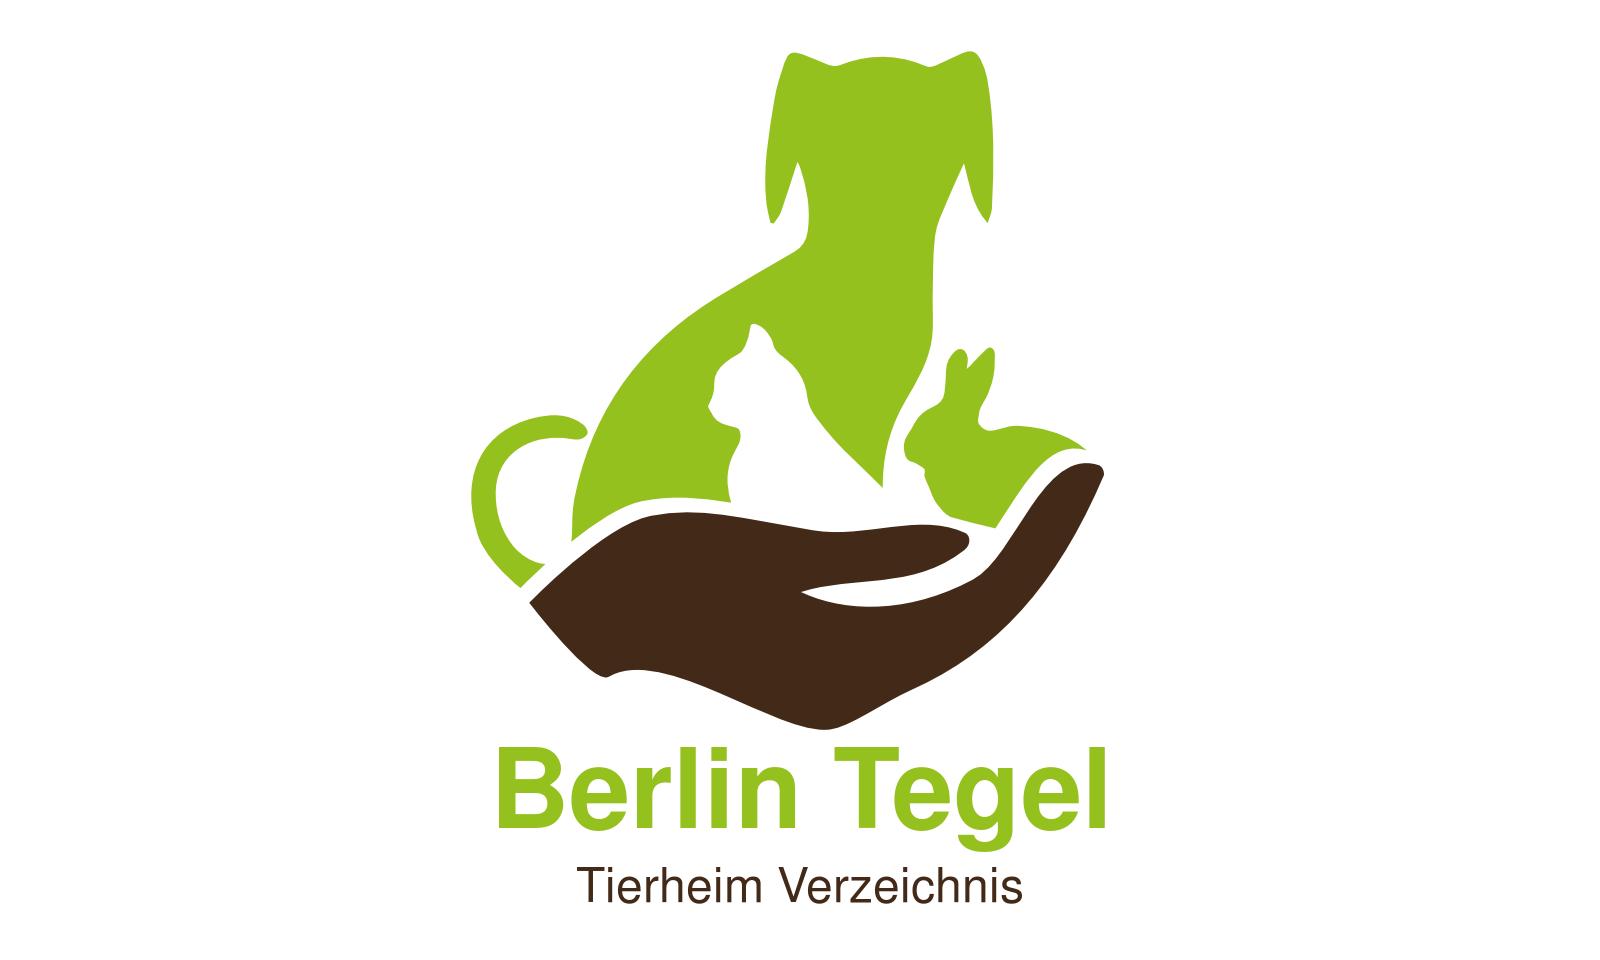 Tierheim Berlin Tegel